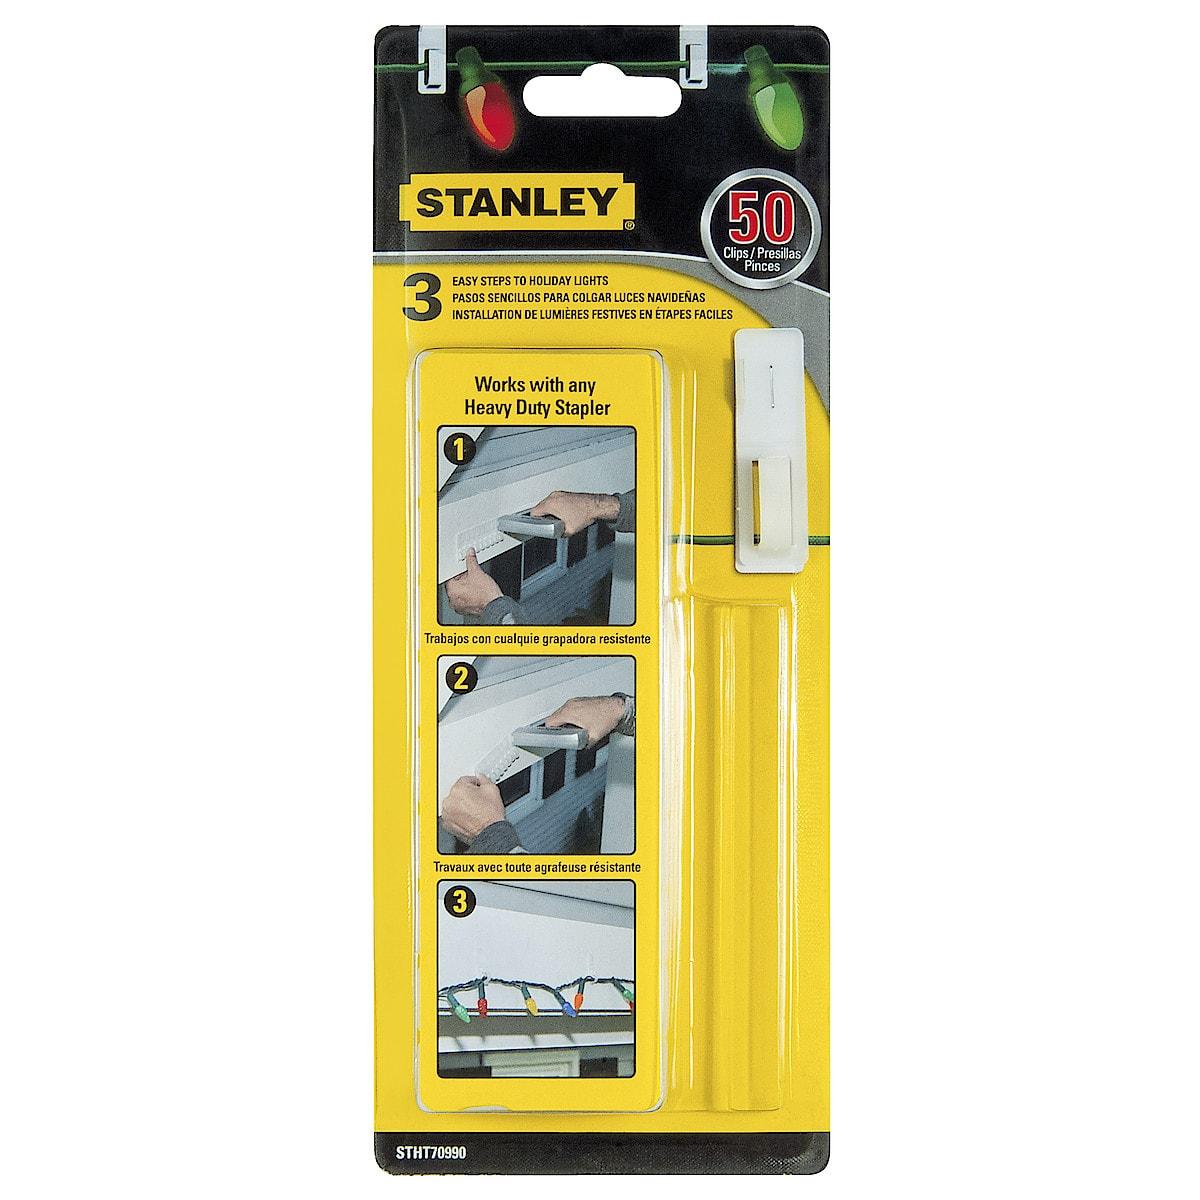 Koukut Stanley